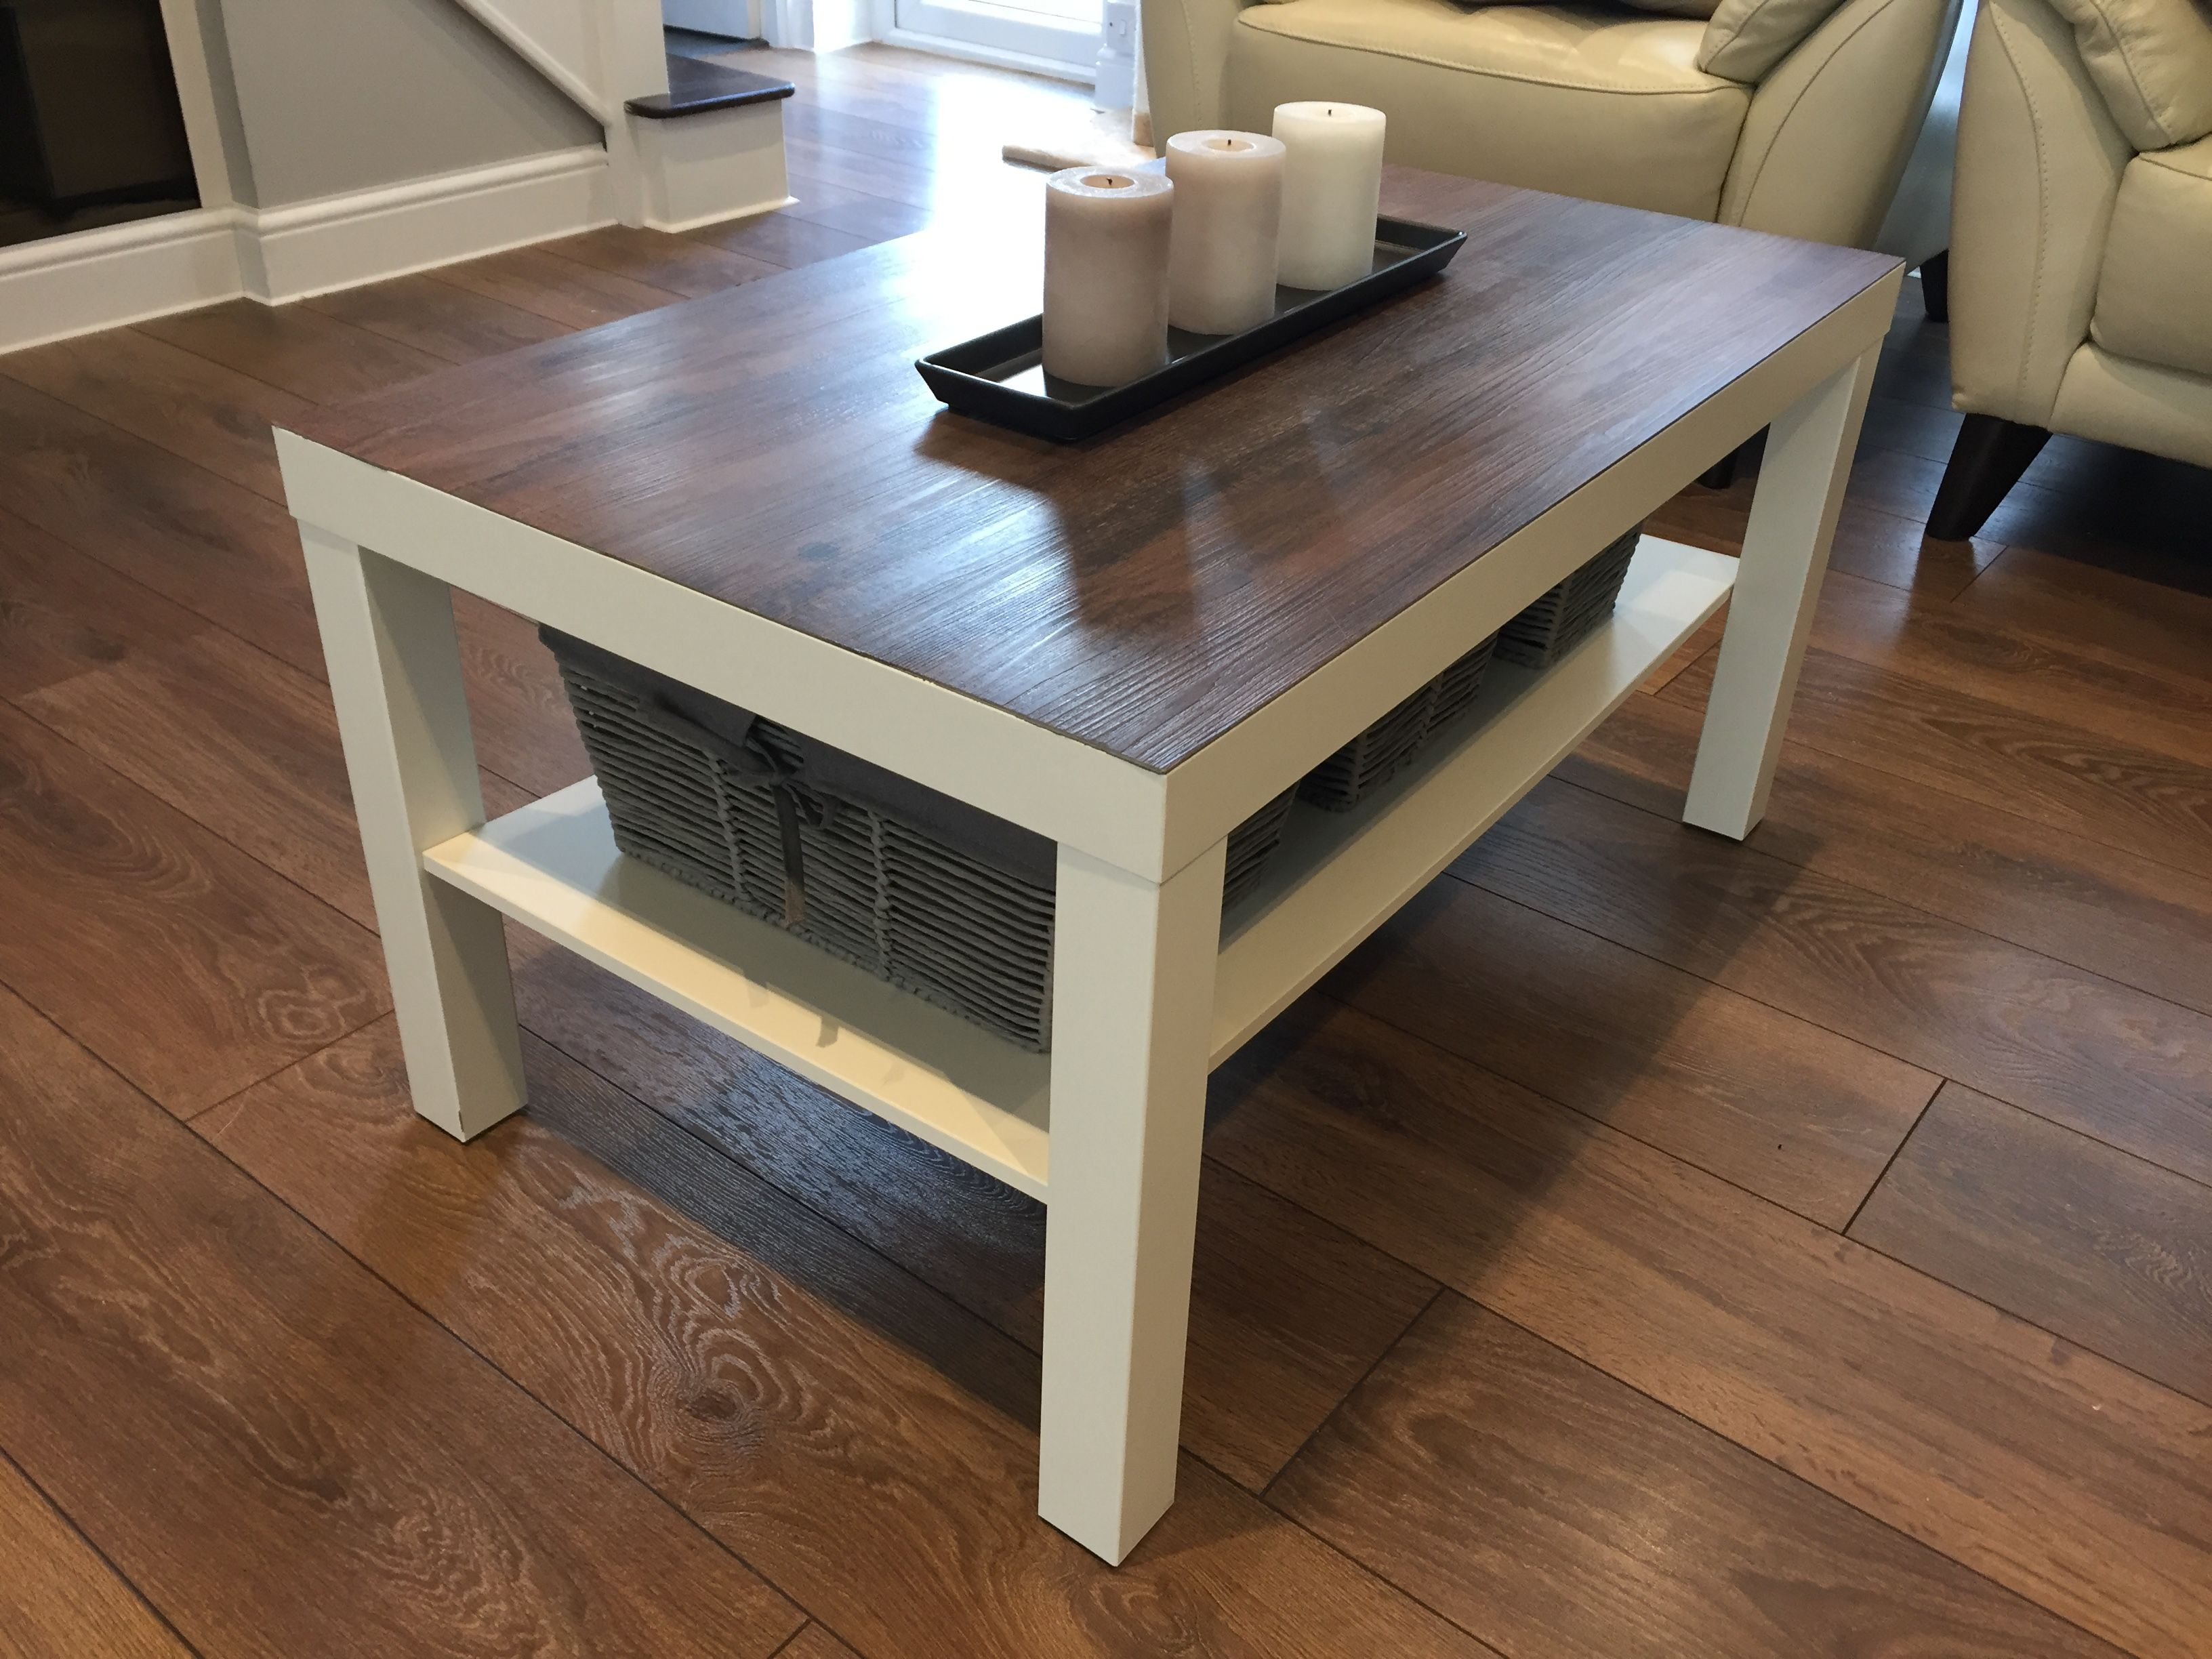 Ikea Lack Coffee Table Hack Using Vinyl Adhesive Flooring Lack Coffee Table Coffee Table Ikea Lack Coffee Table [ 2448 x 3264 Pixel ]